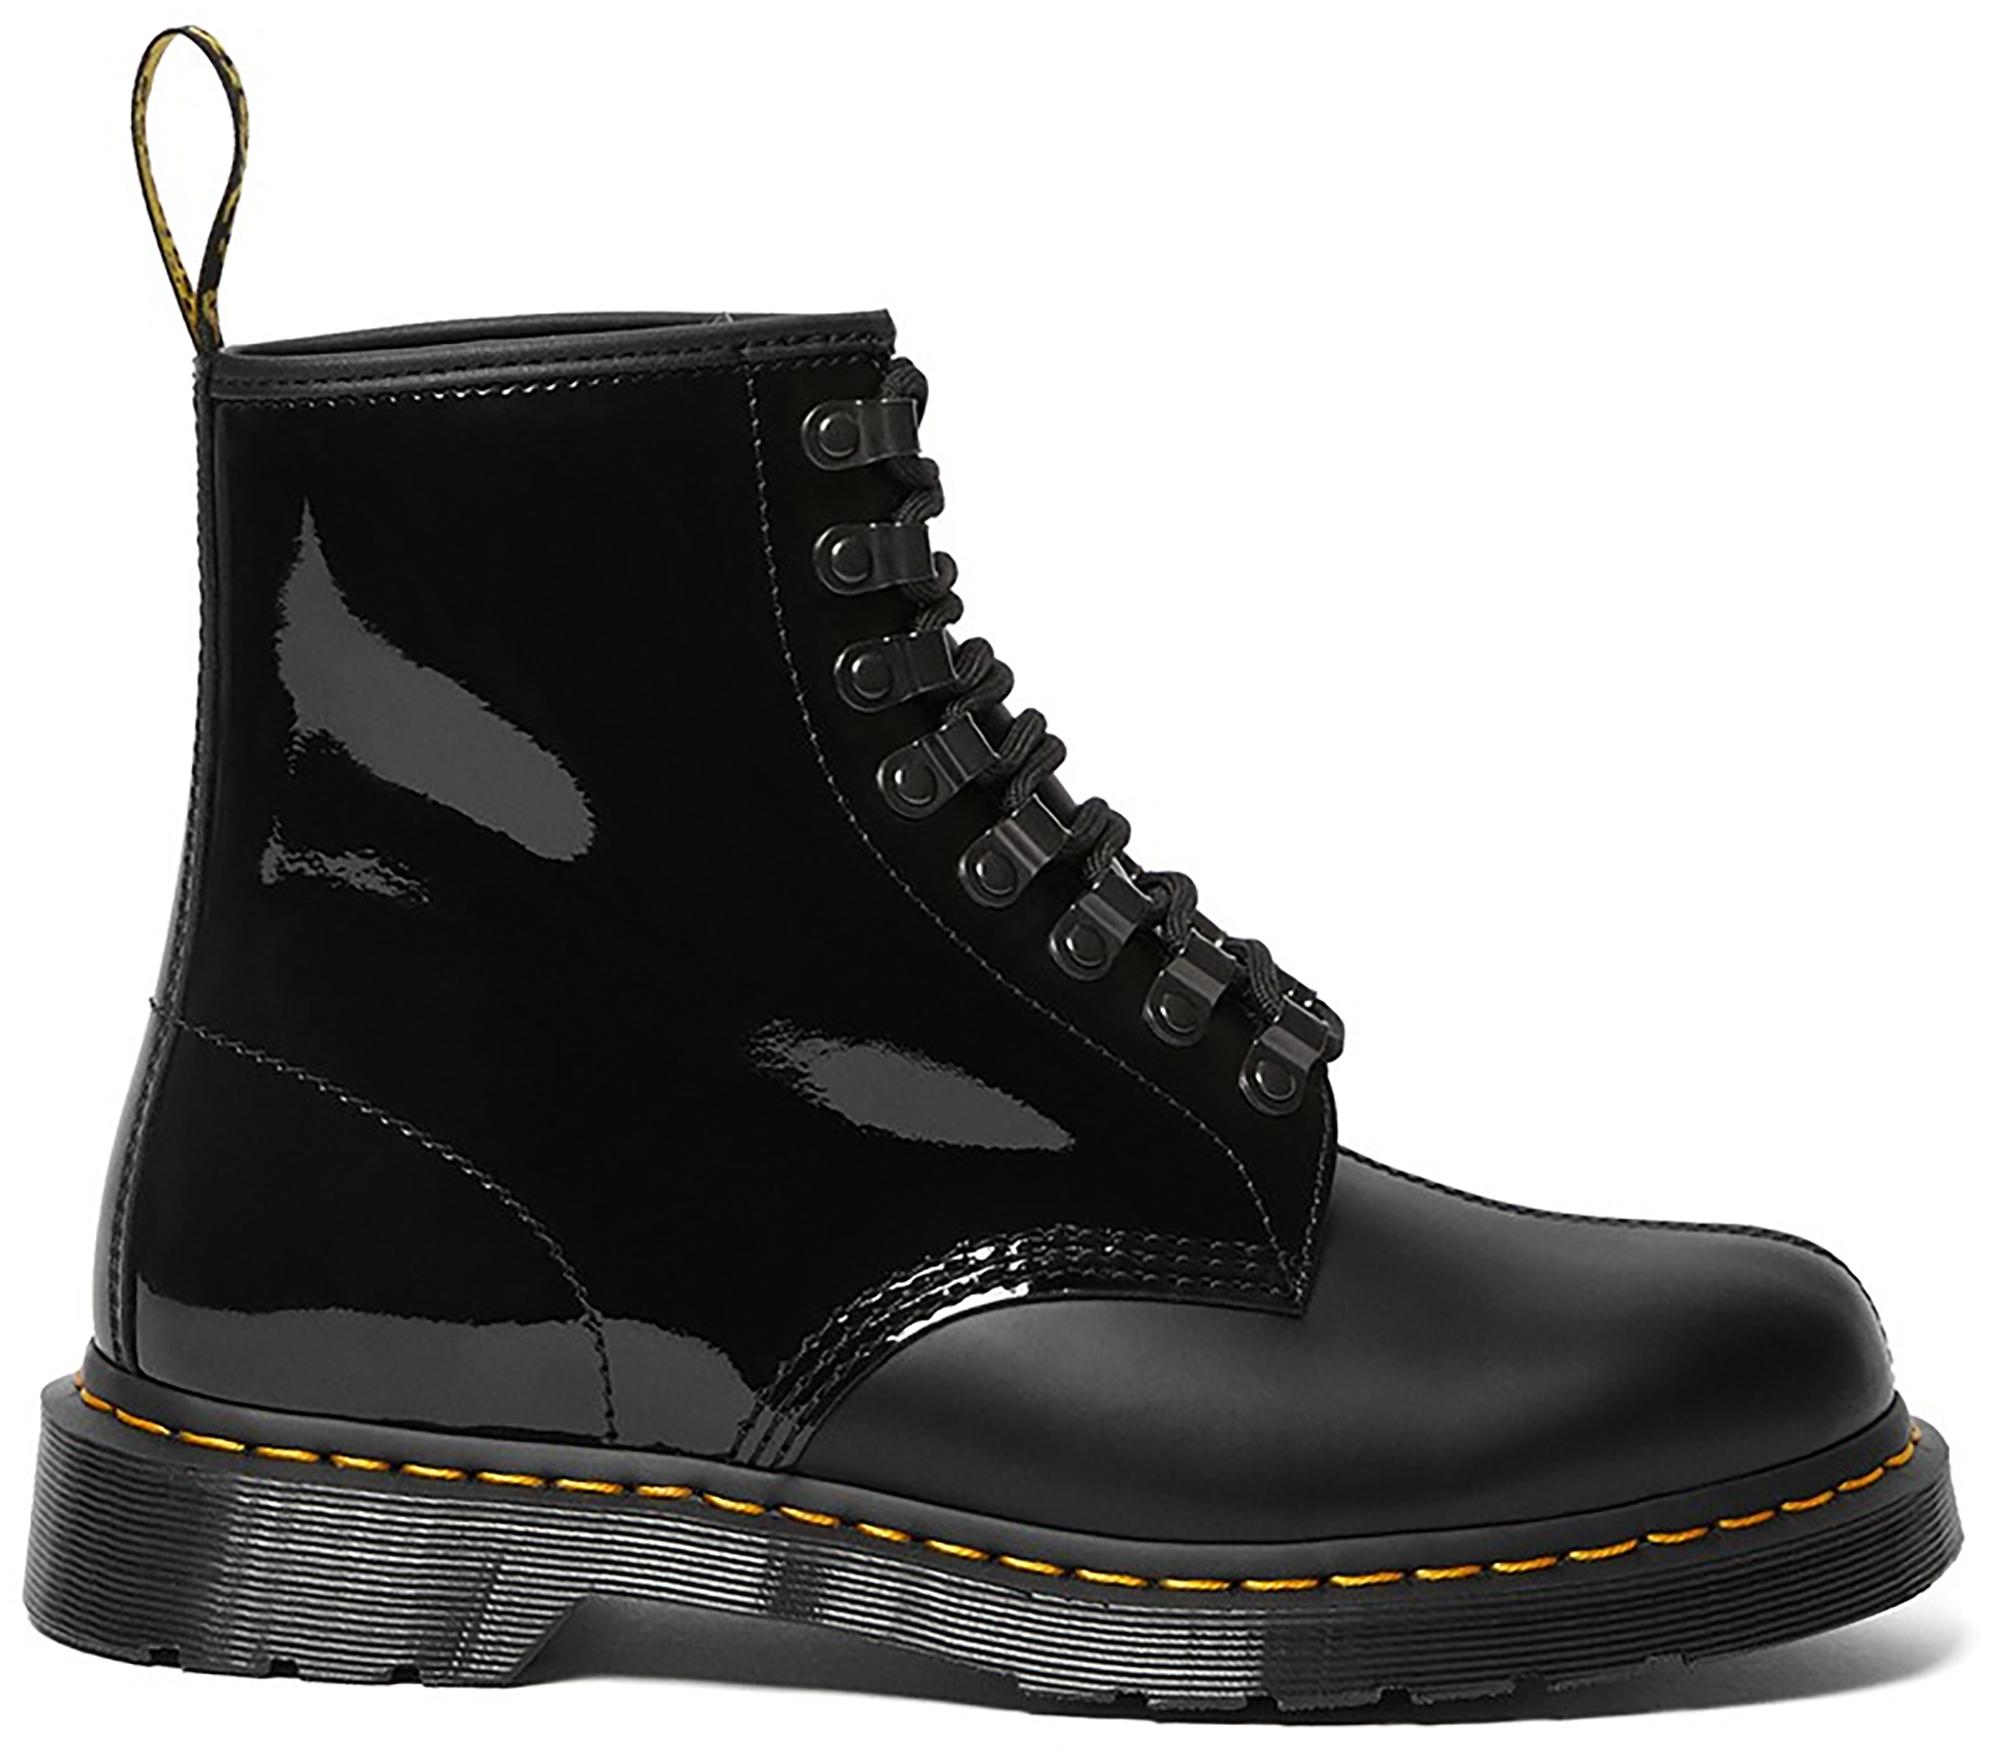 Dr. Martens 1460 Pleasures Black - Sneakers